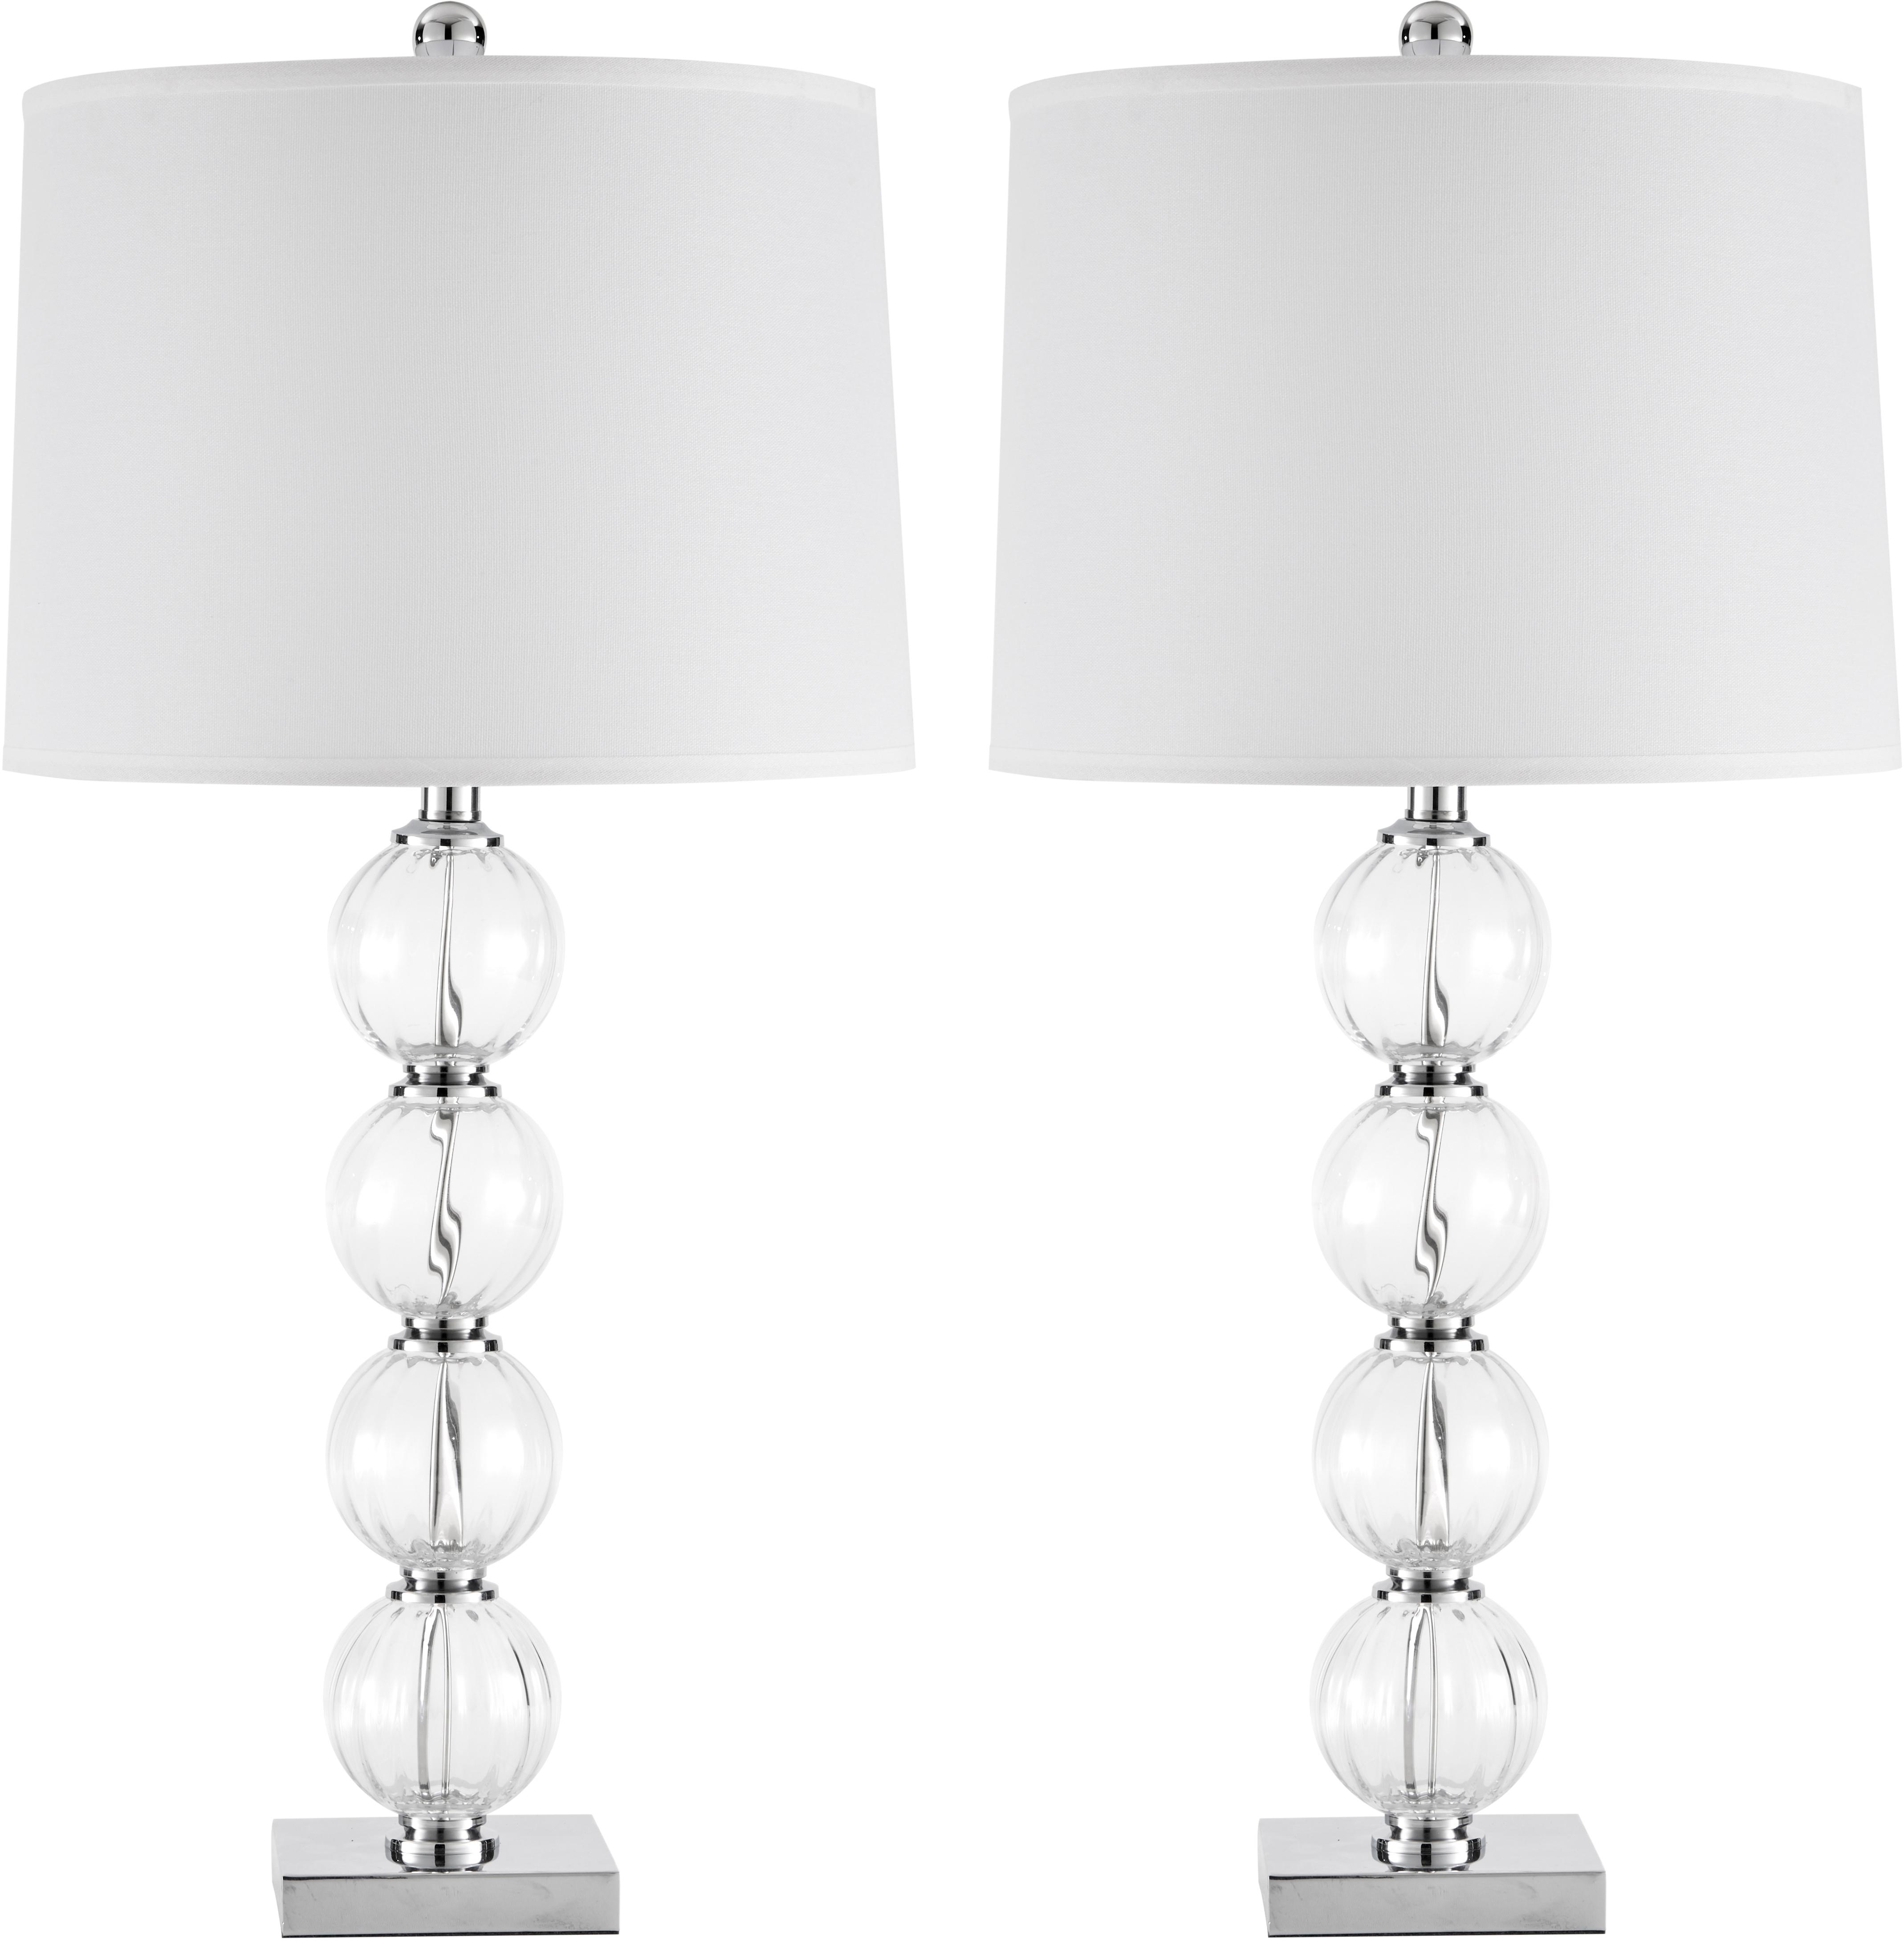 Grosse Tischlampen Luisa, 2 Stück, Lampenschirm: Polyester, Sockel: Metall, Lampenschirm: Weiss<br>Lampenfuss: Transparent, Ø 38 x H 76 cm